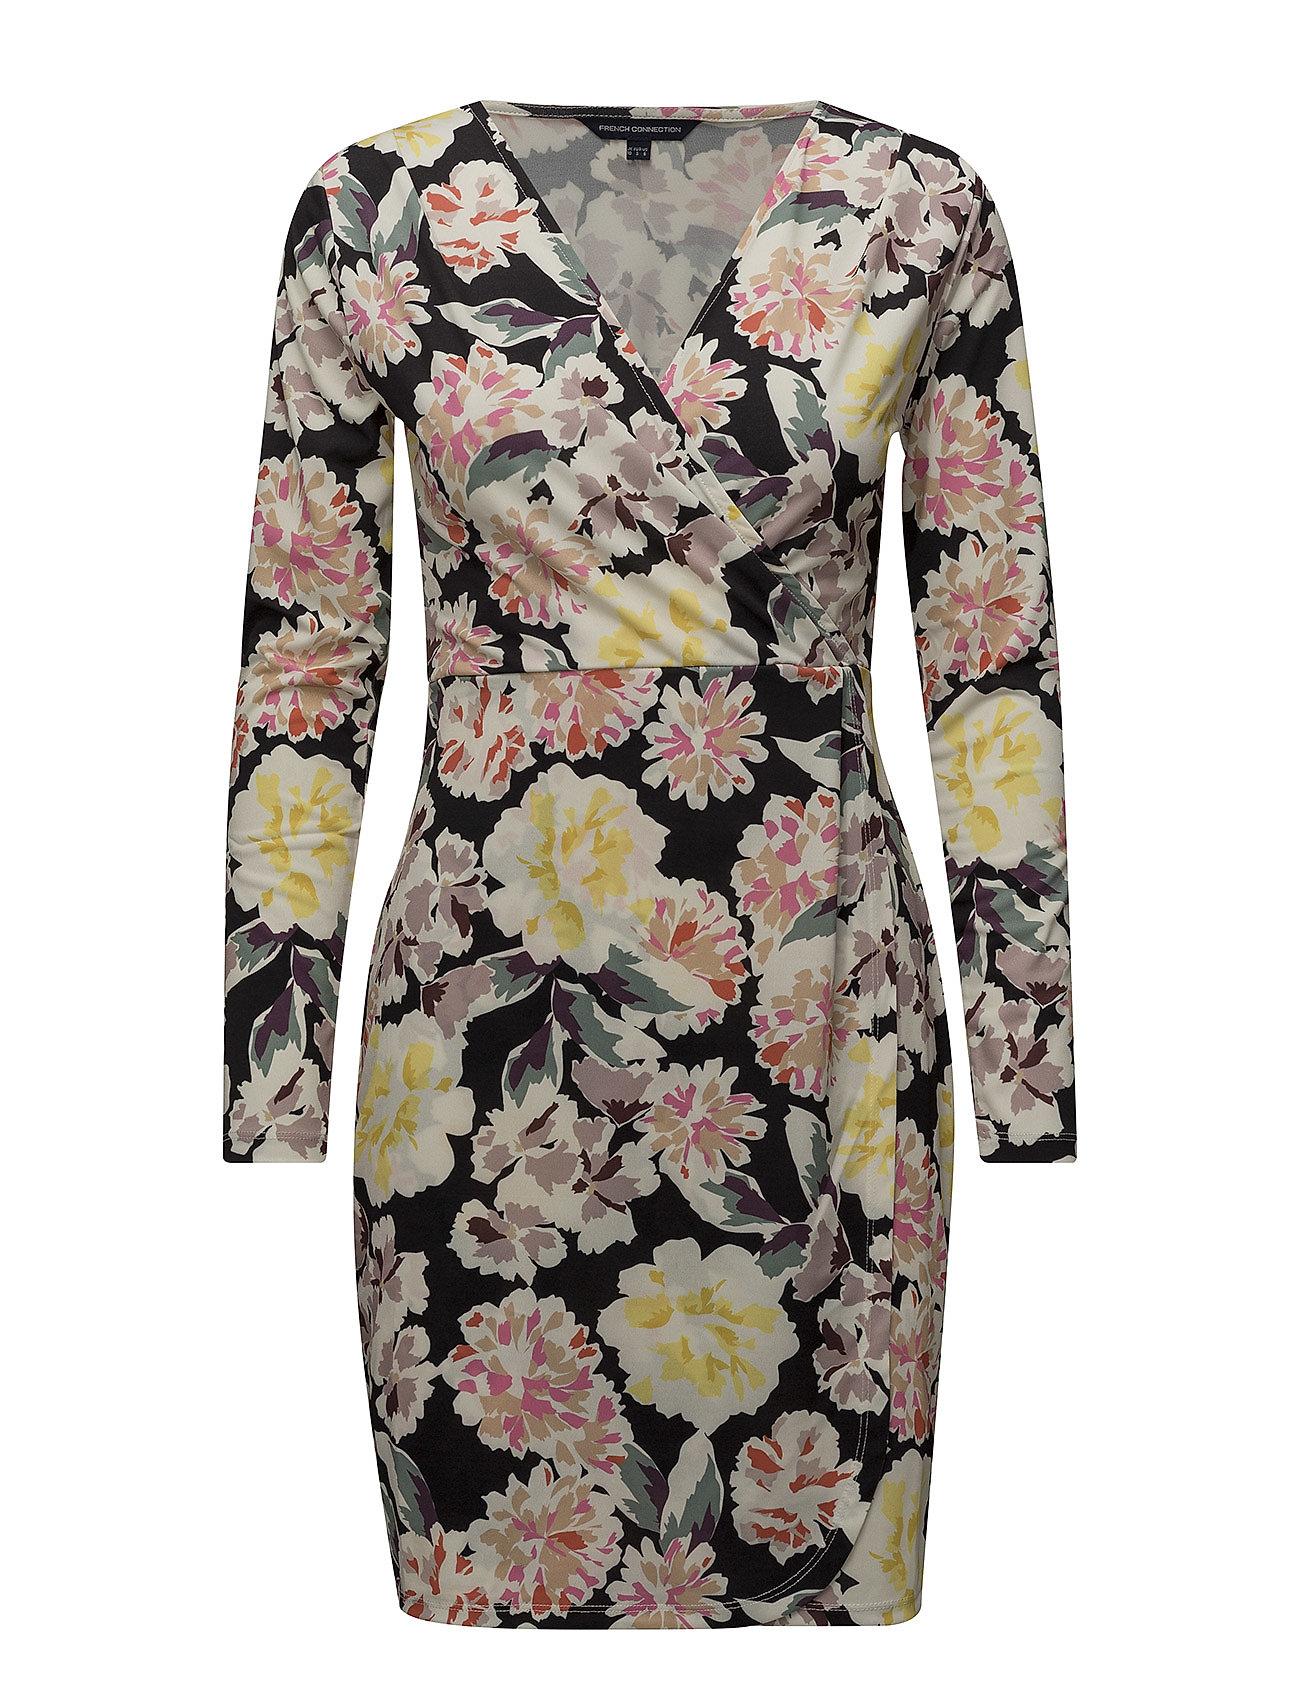 9245981a975 Enoshima Print V-neck Jersey Dress (Black Multi) (66 €) - French ...